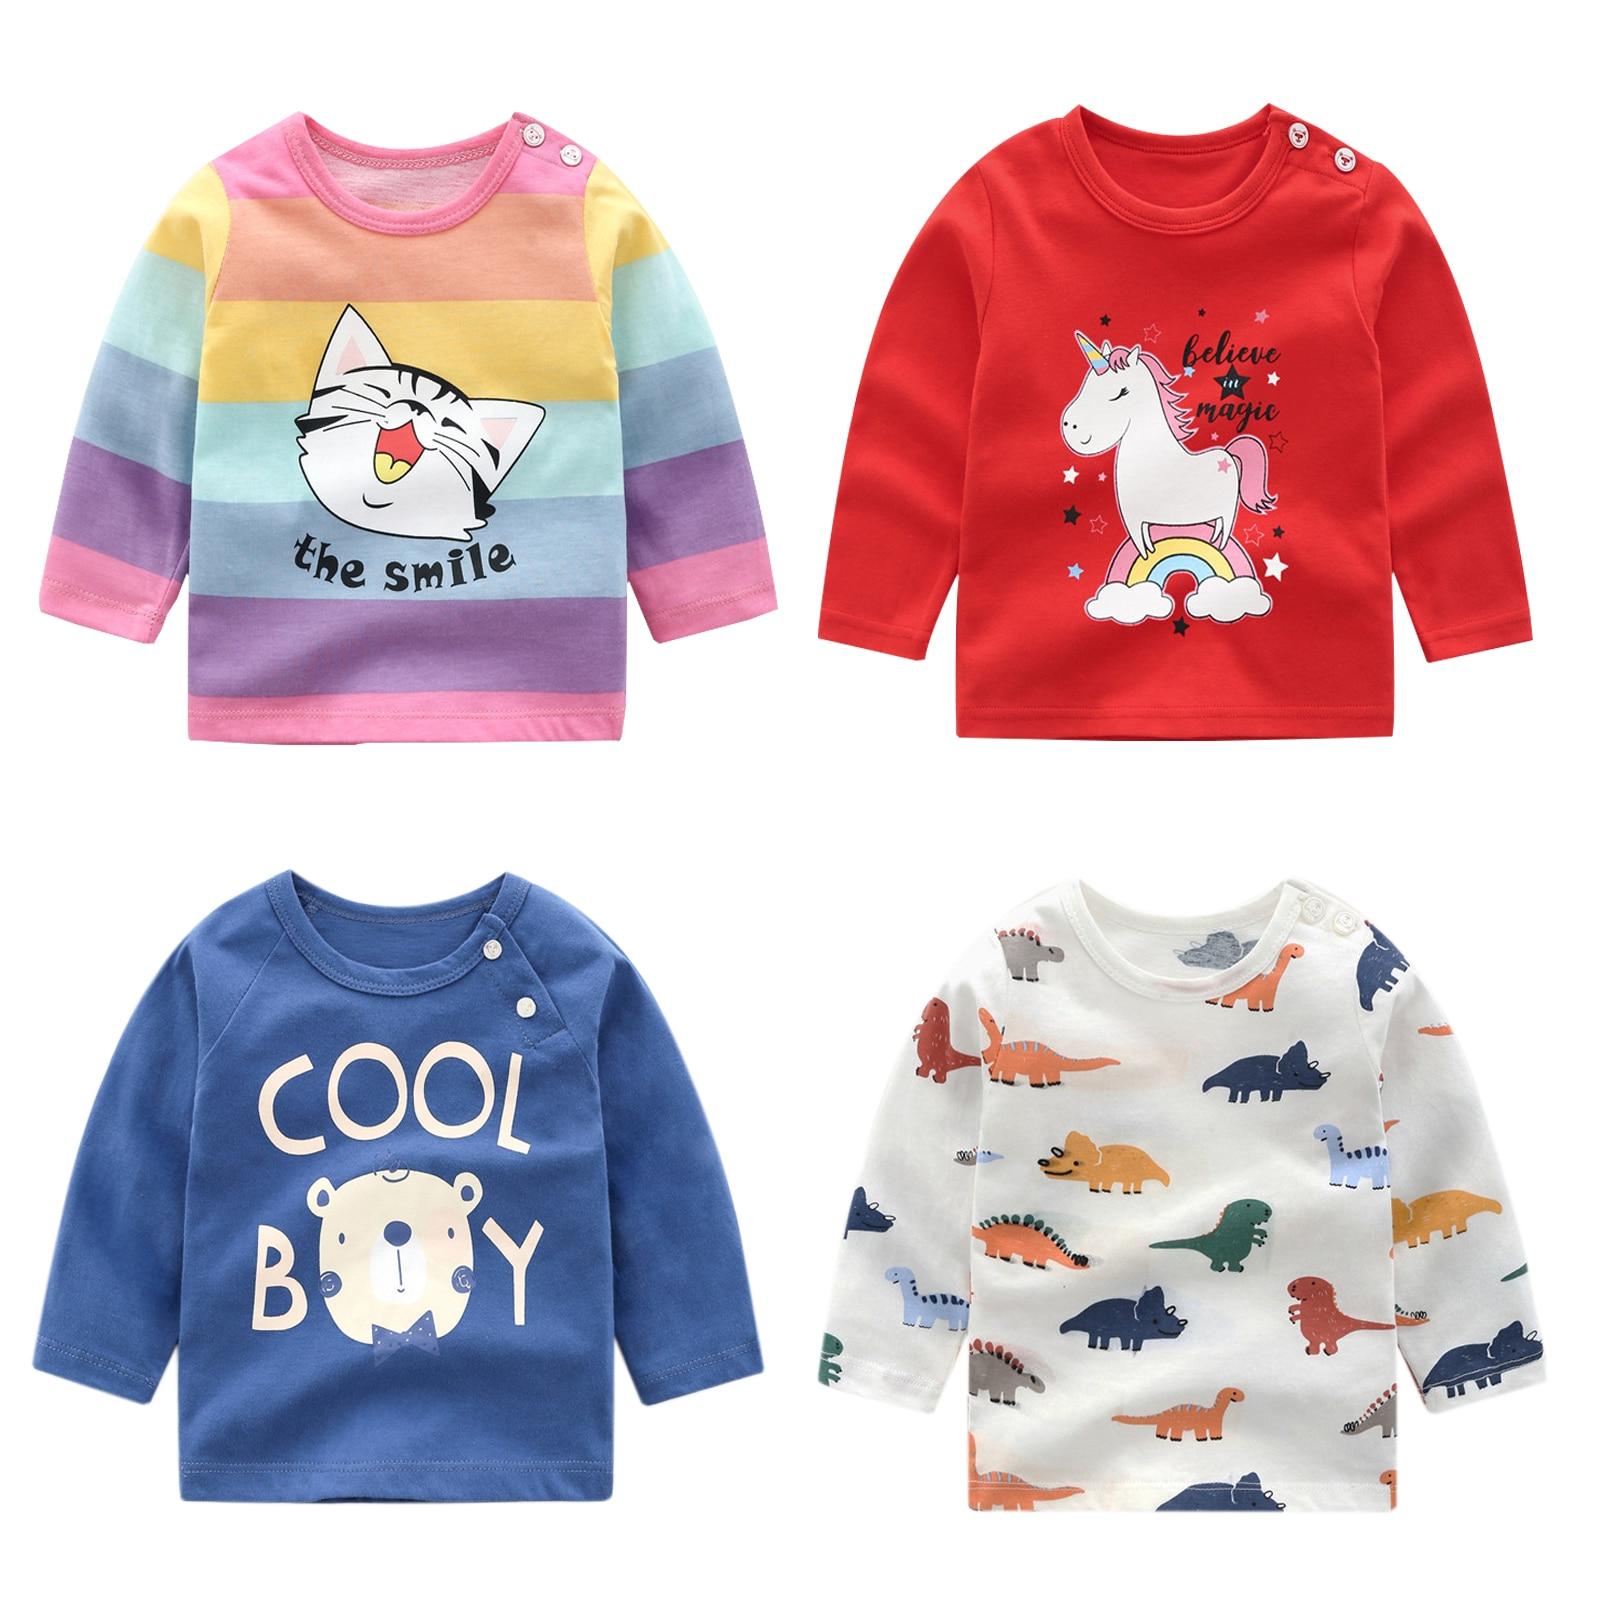 Unisex 6M-5T Autumn Winter Cotton T shirt Cartoon Long Sleeve Baby Boys Girls Tees Kids Children Casual Clothing O-Neck Clothes